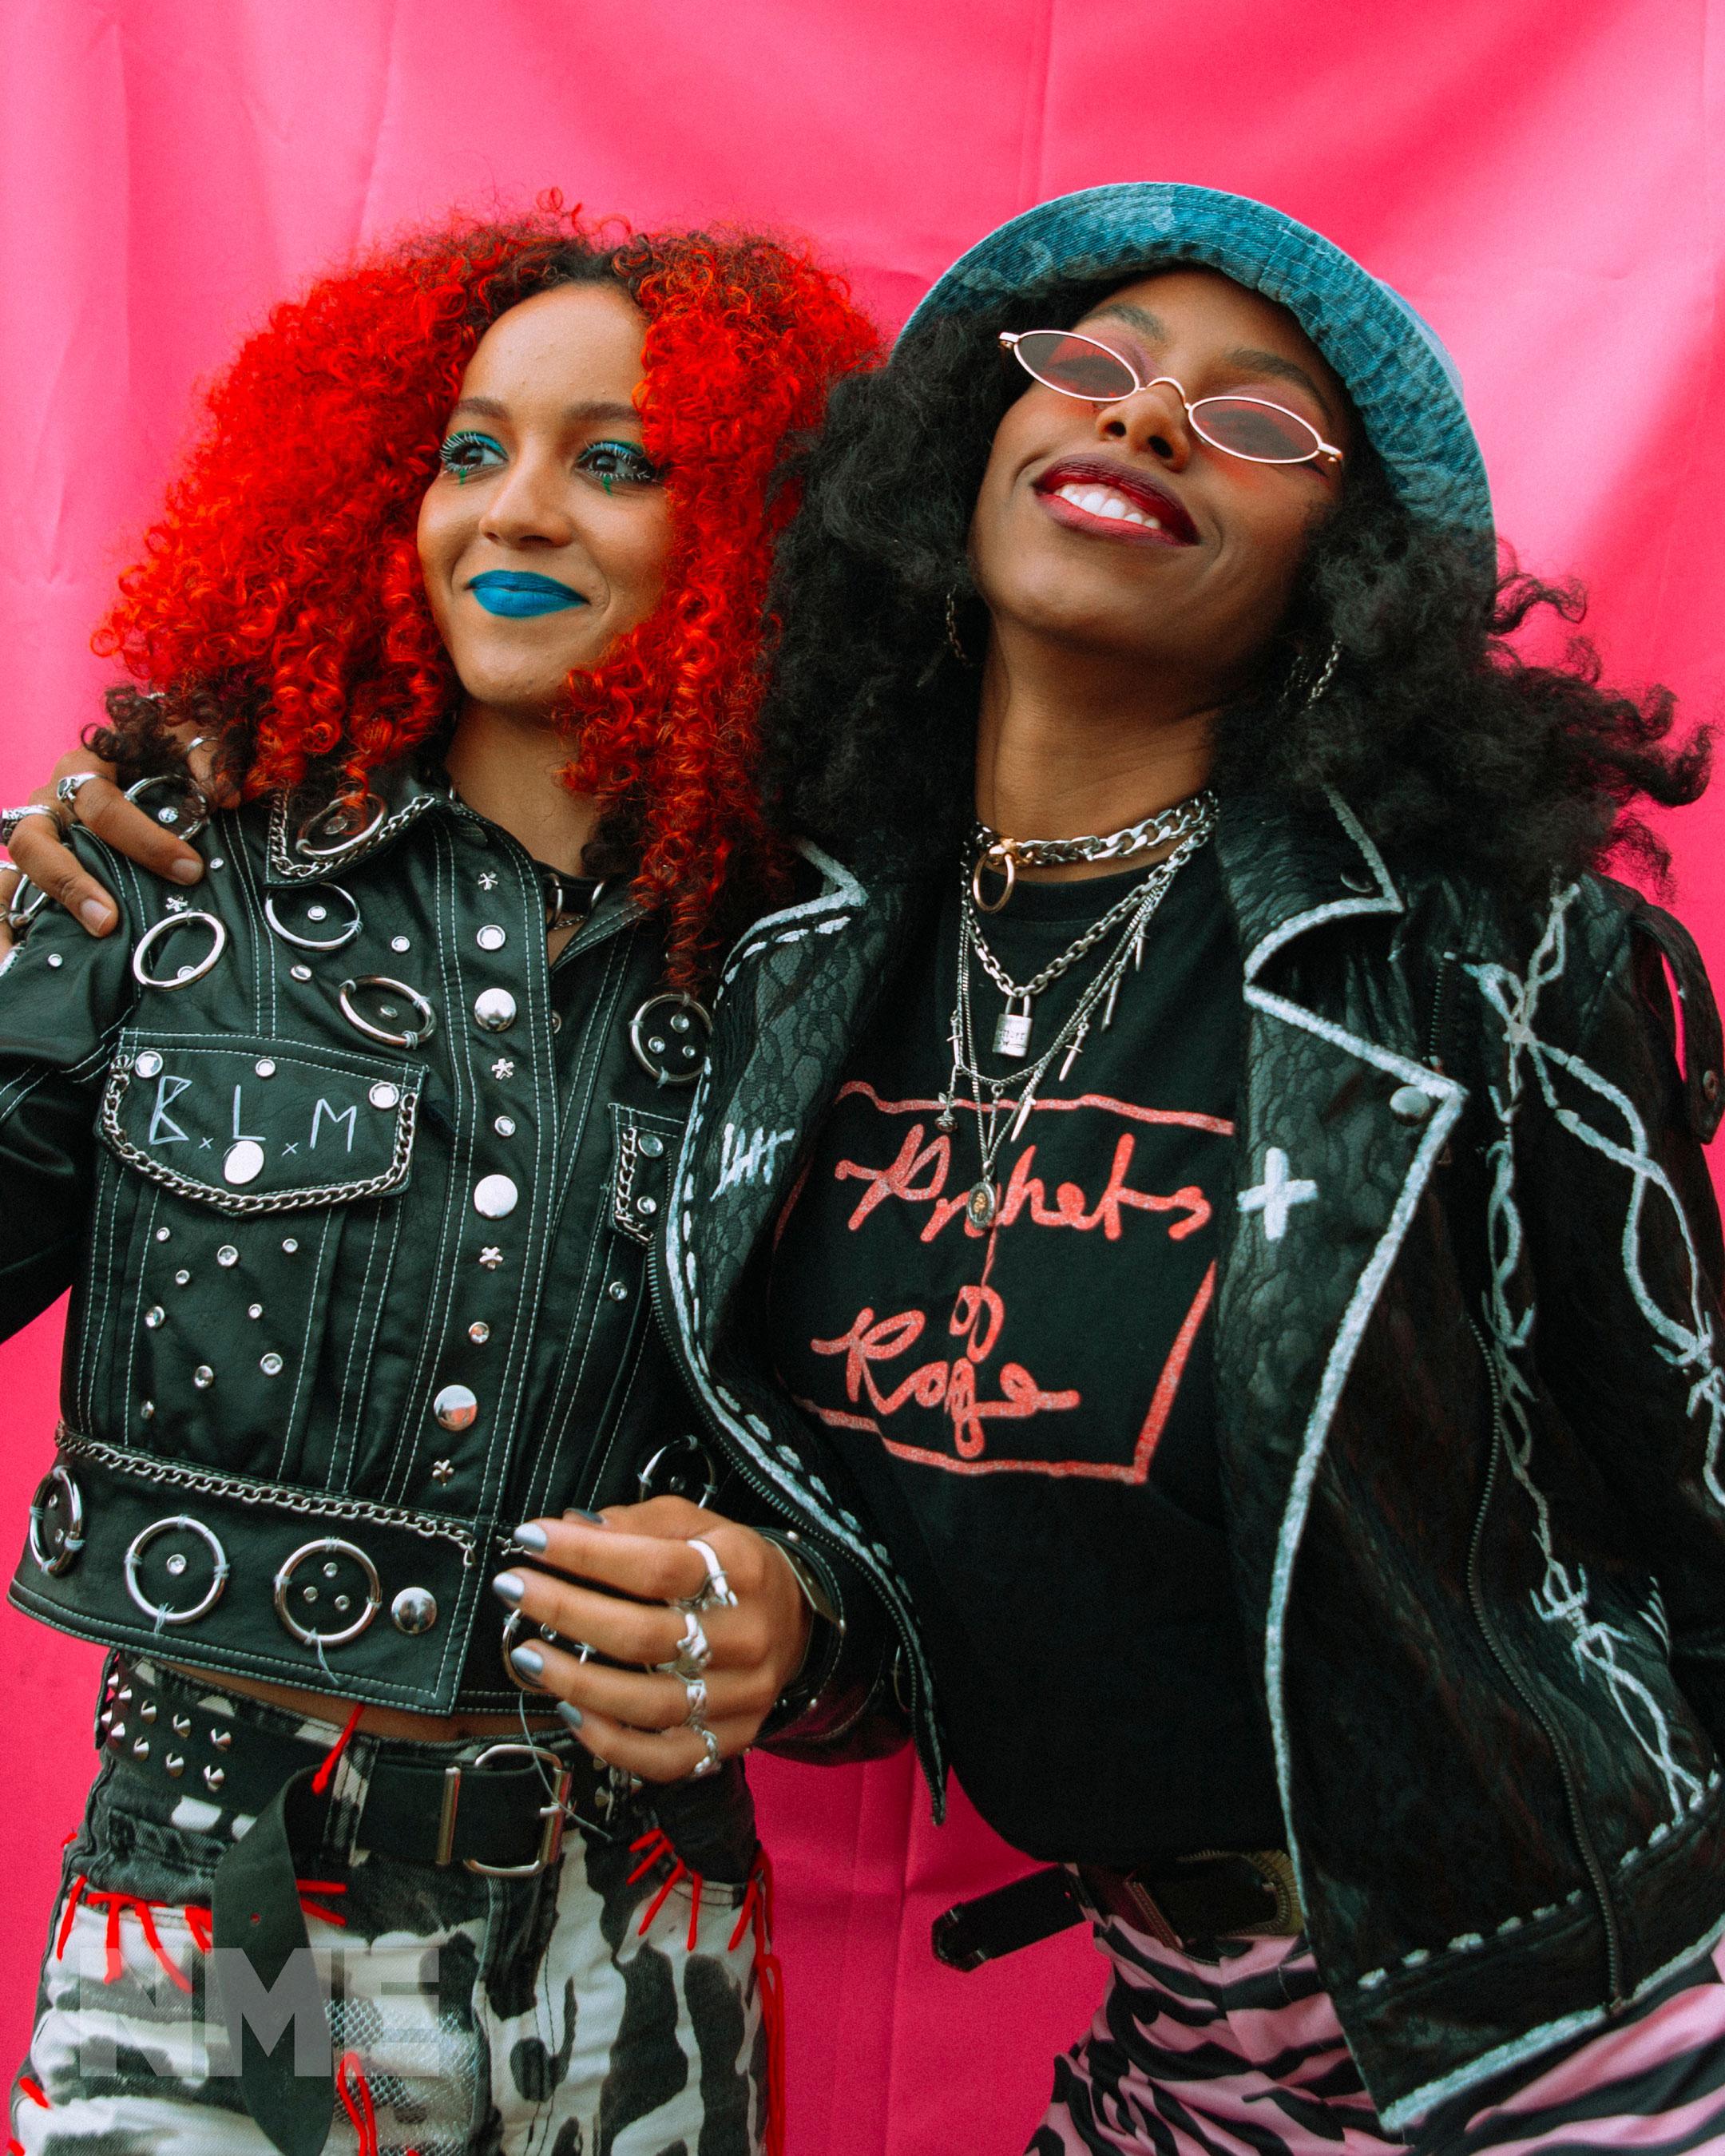 NME Cover 2021 Nova Twins